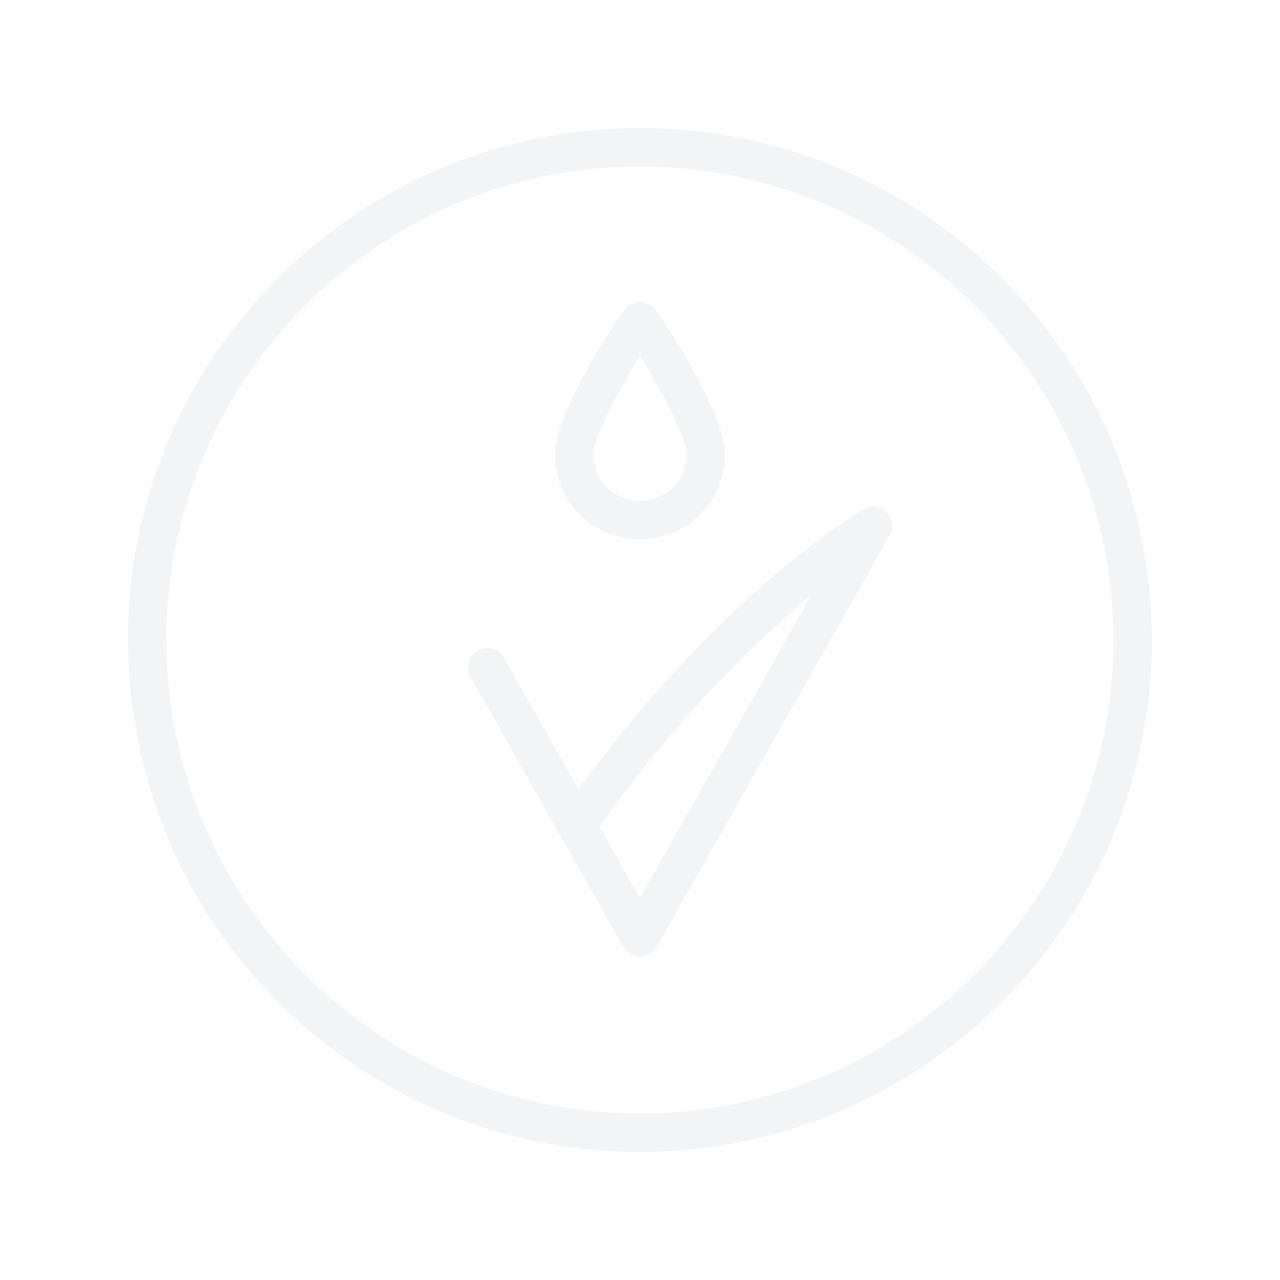 THE SKIN HOUSE Wrinkle Collagen Mask 20g